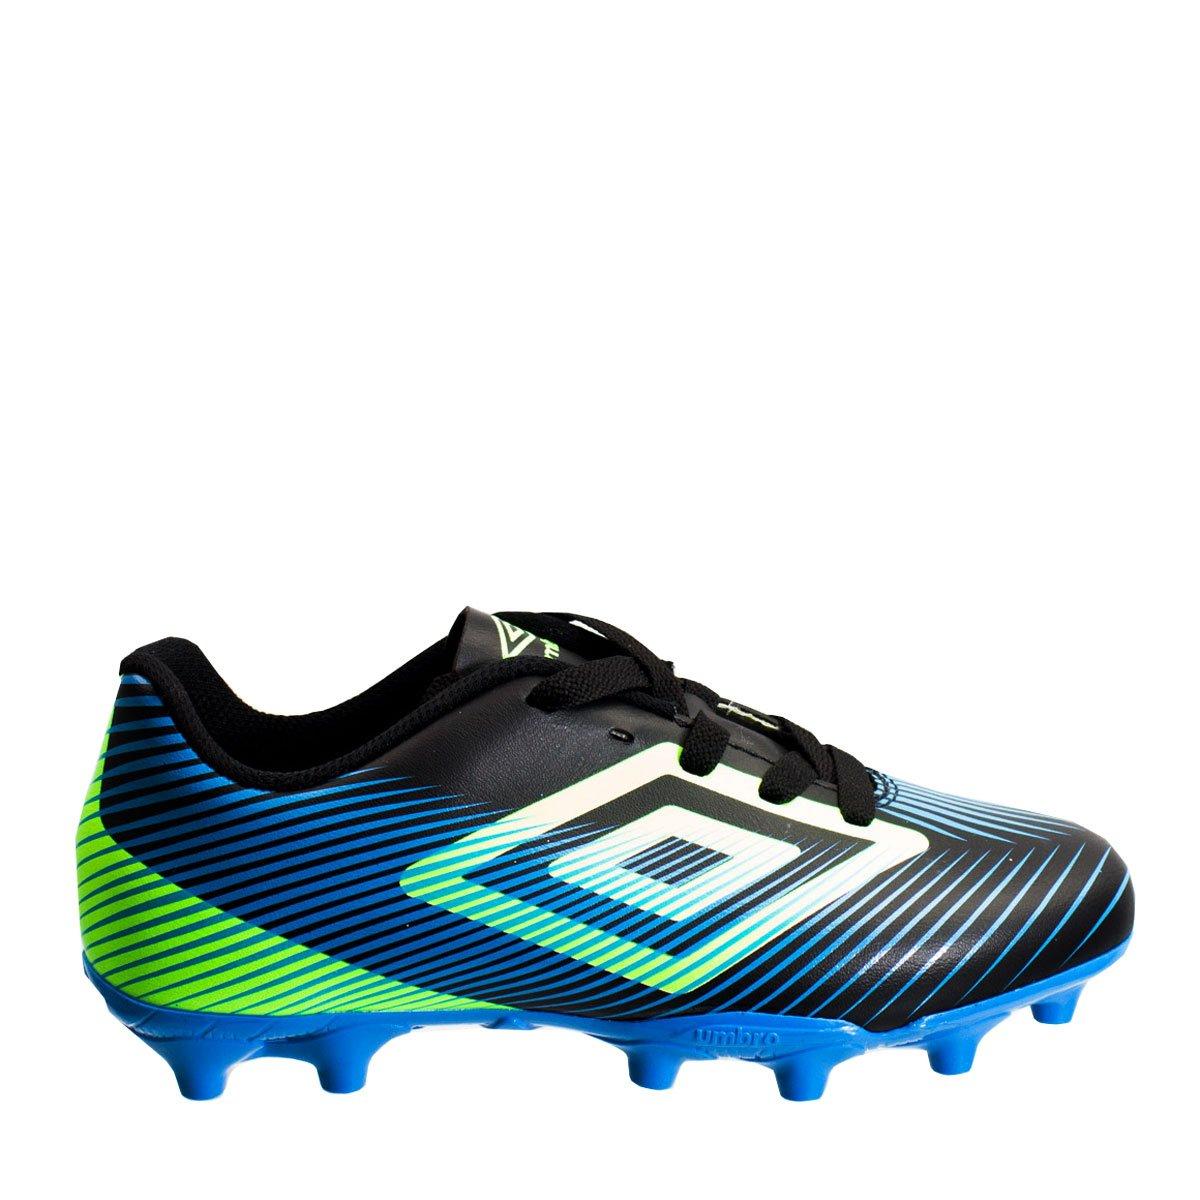 Bizz Store - Chuteira Infantil Futebol de Campo Umbro Speed II JR 62369c922f57a